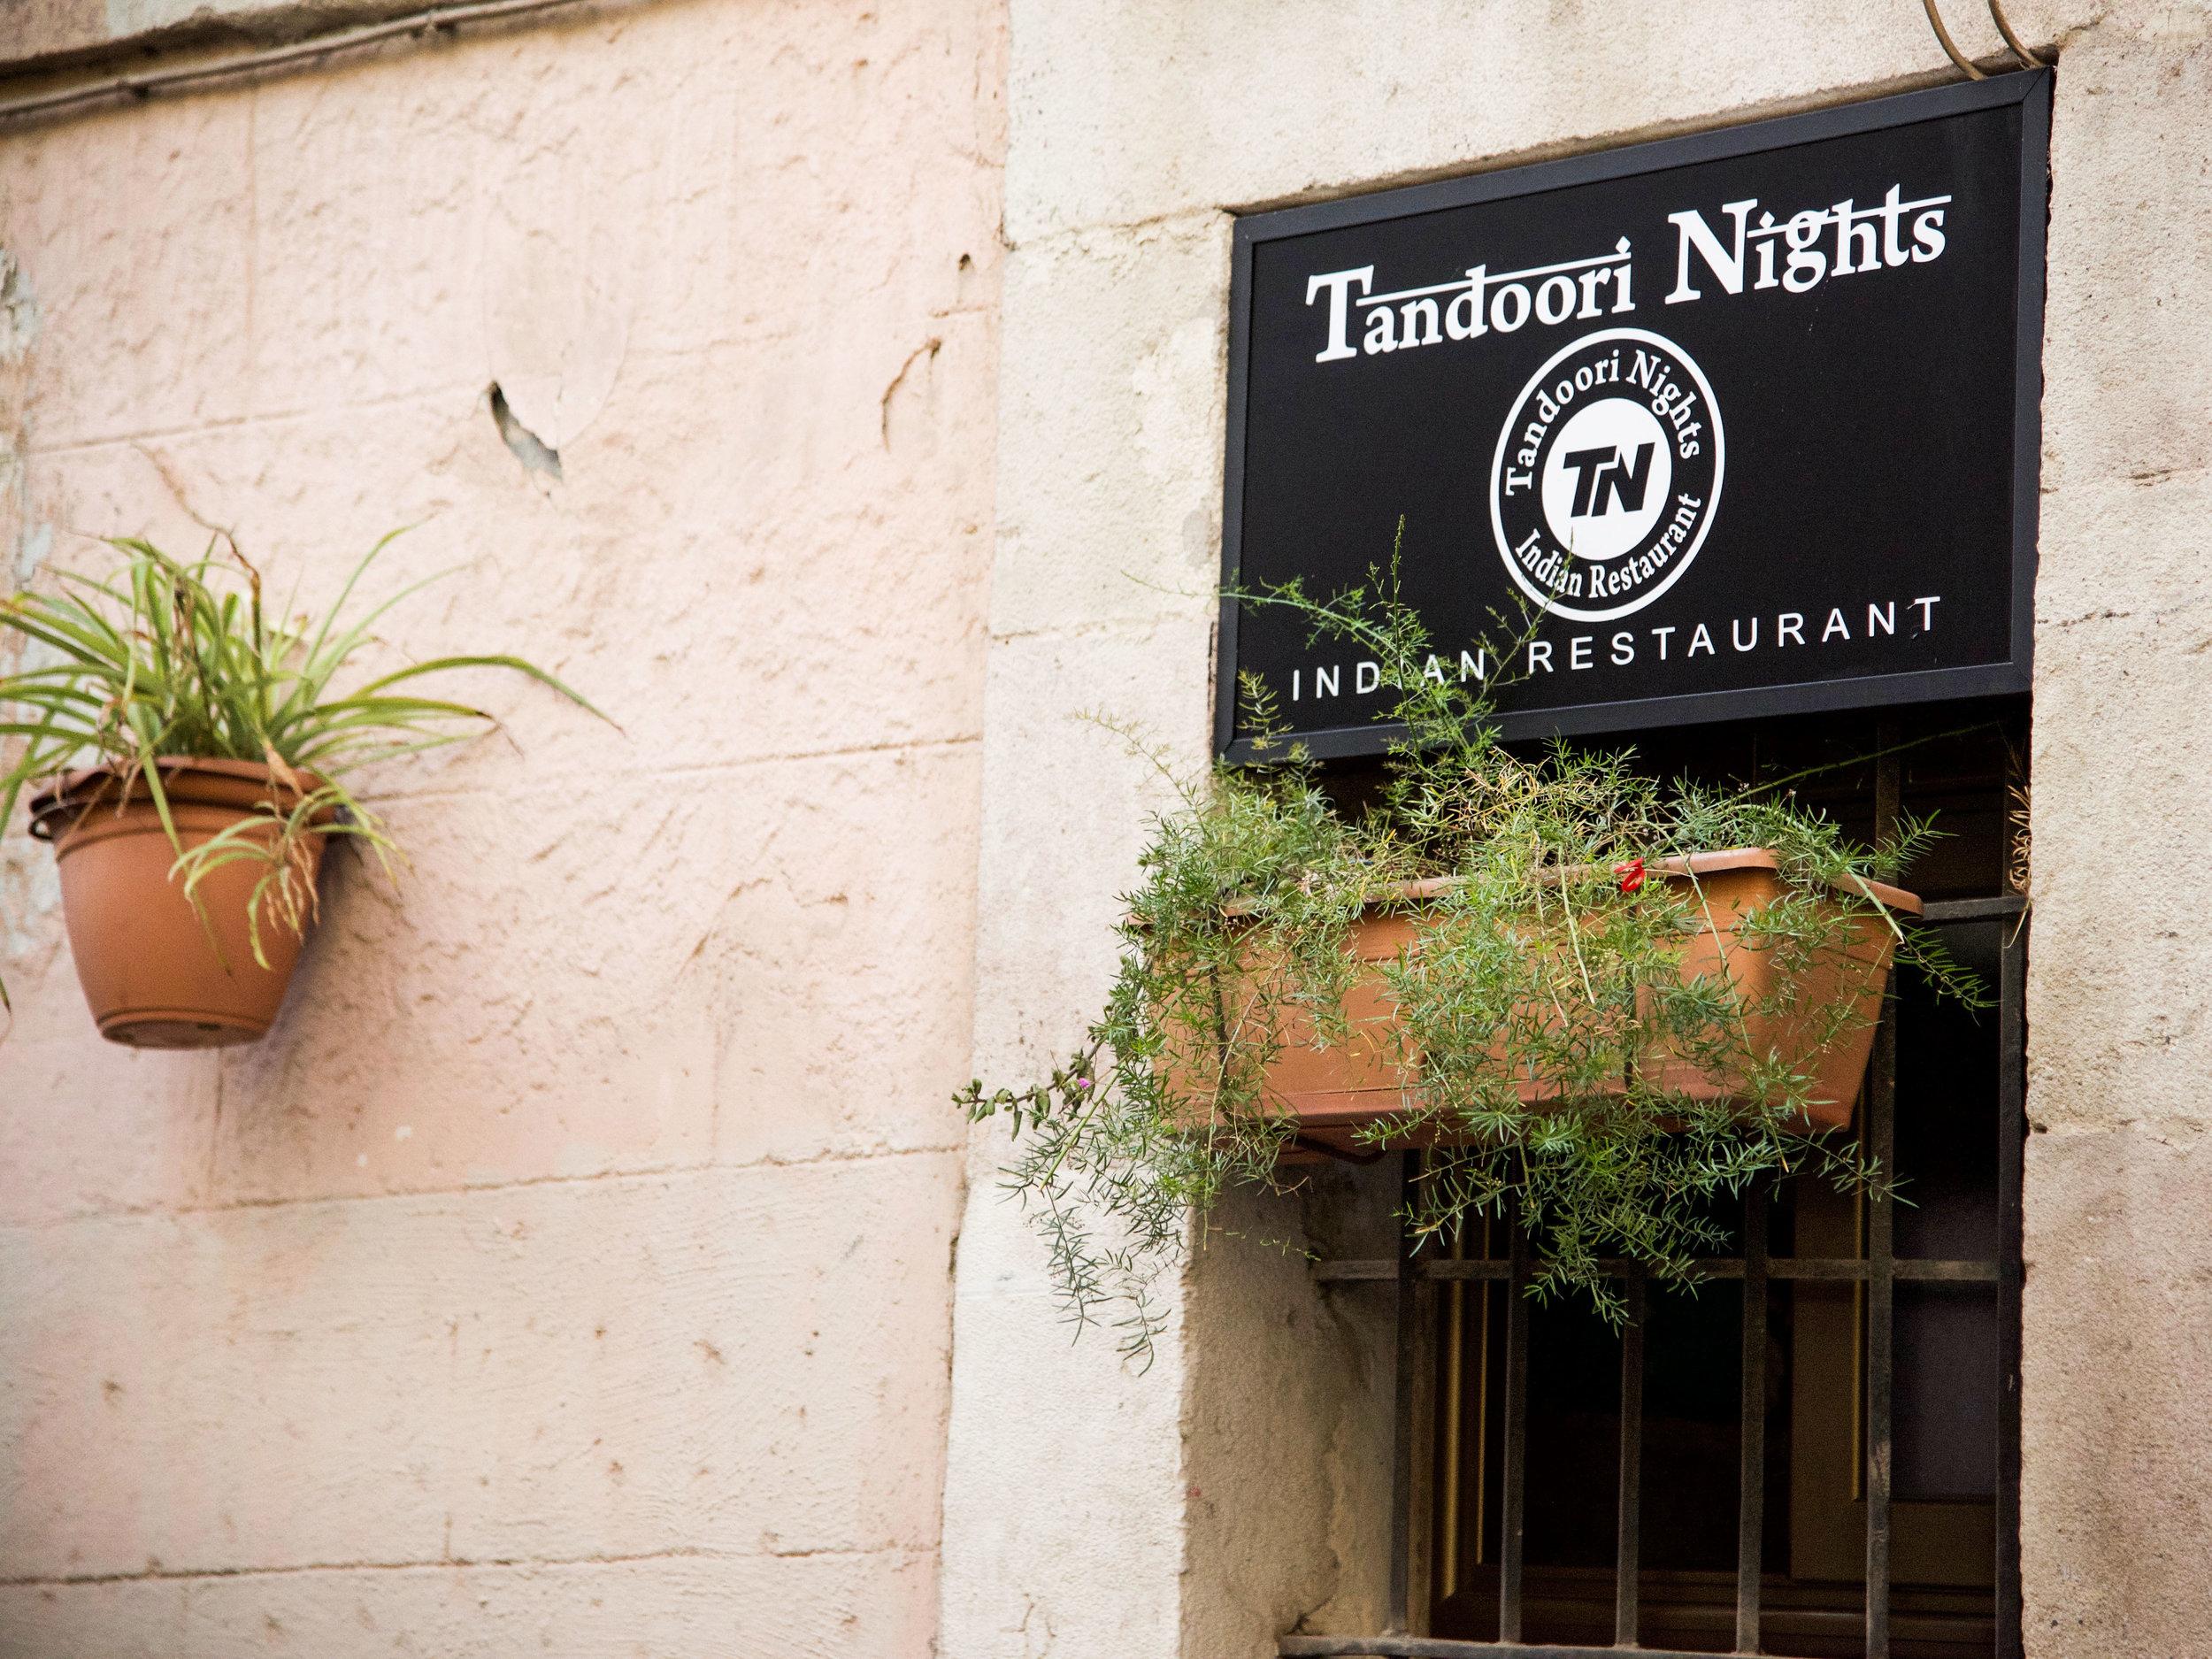 Tandoori-Nights-Barcelona-Spain-Indian-Restaurant-Window.jpg